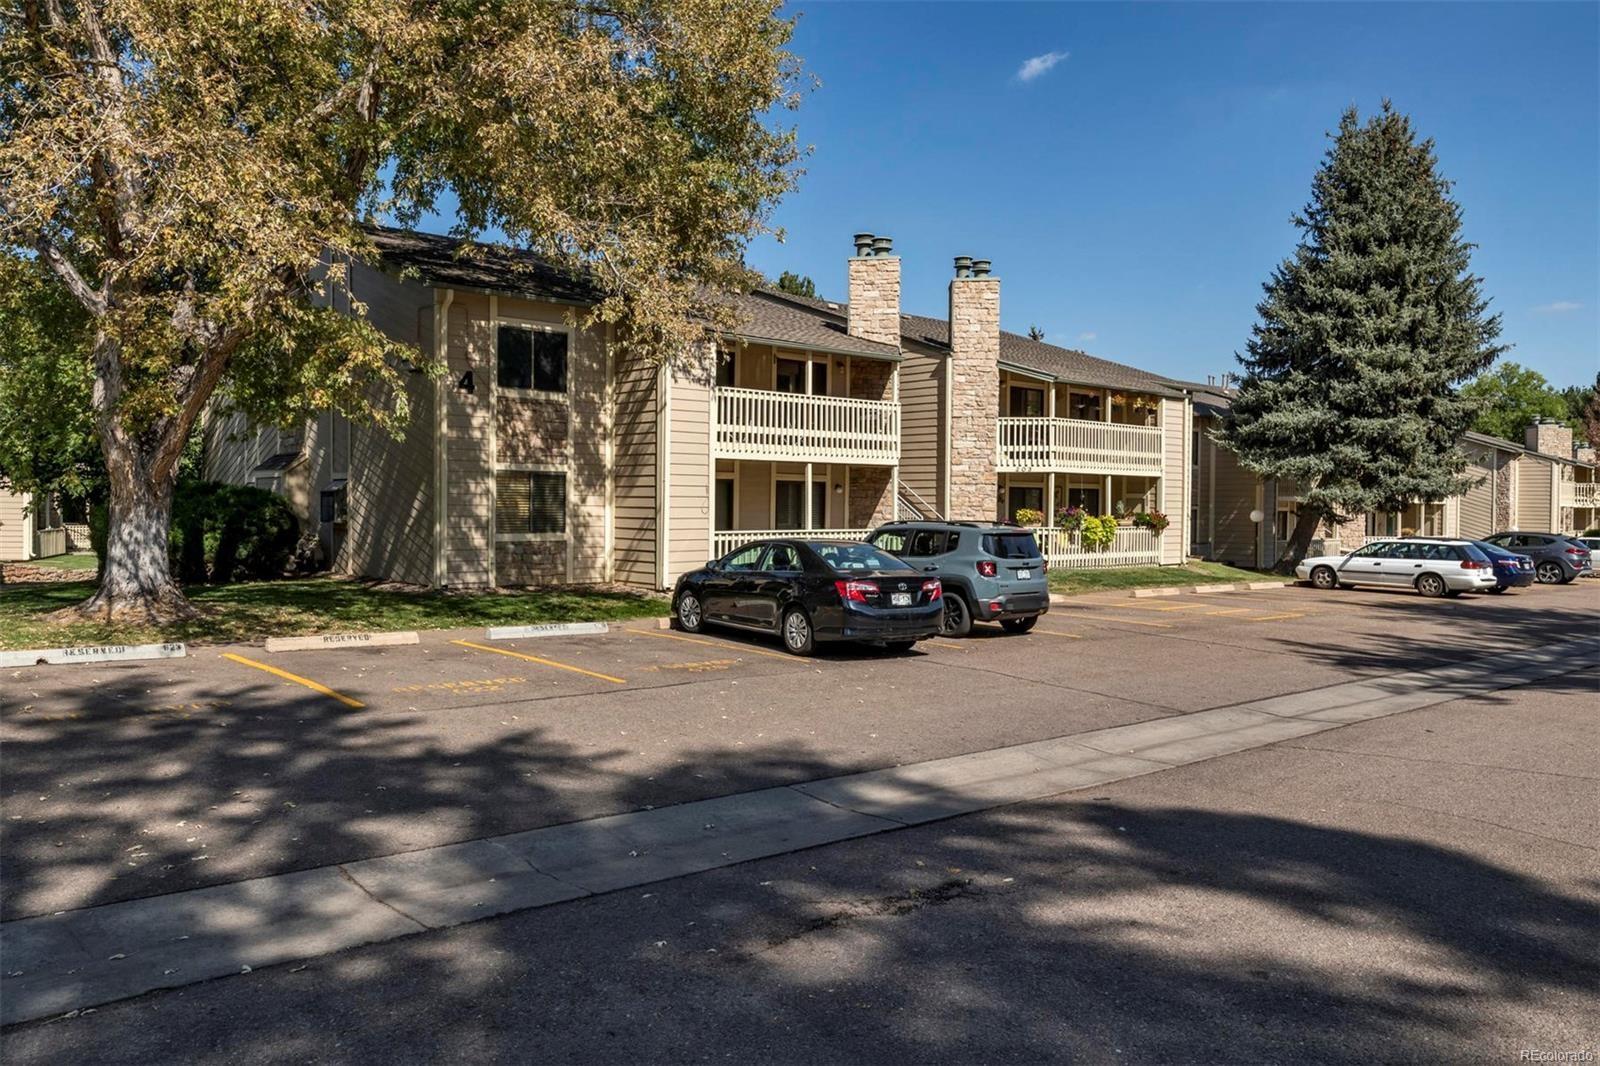 MLS# 8601973 - 18 - 8335 Fairmount Drive #207, Denver, CO 80247